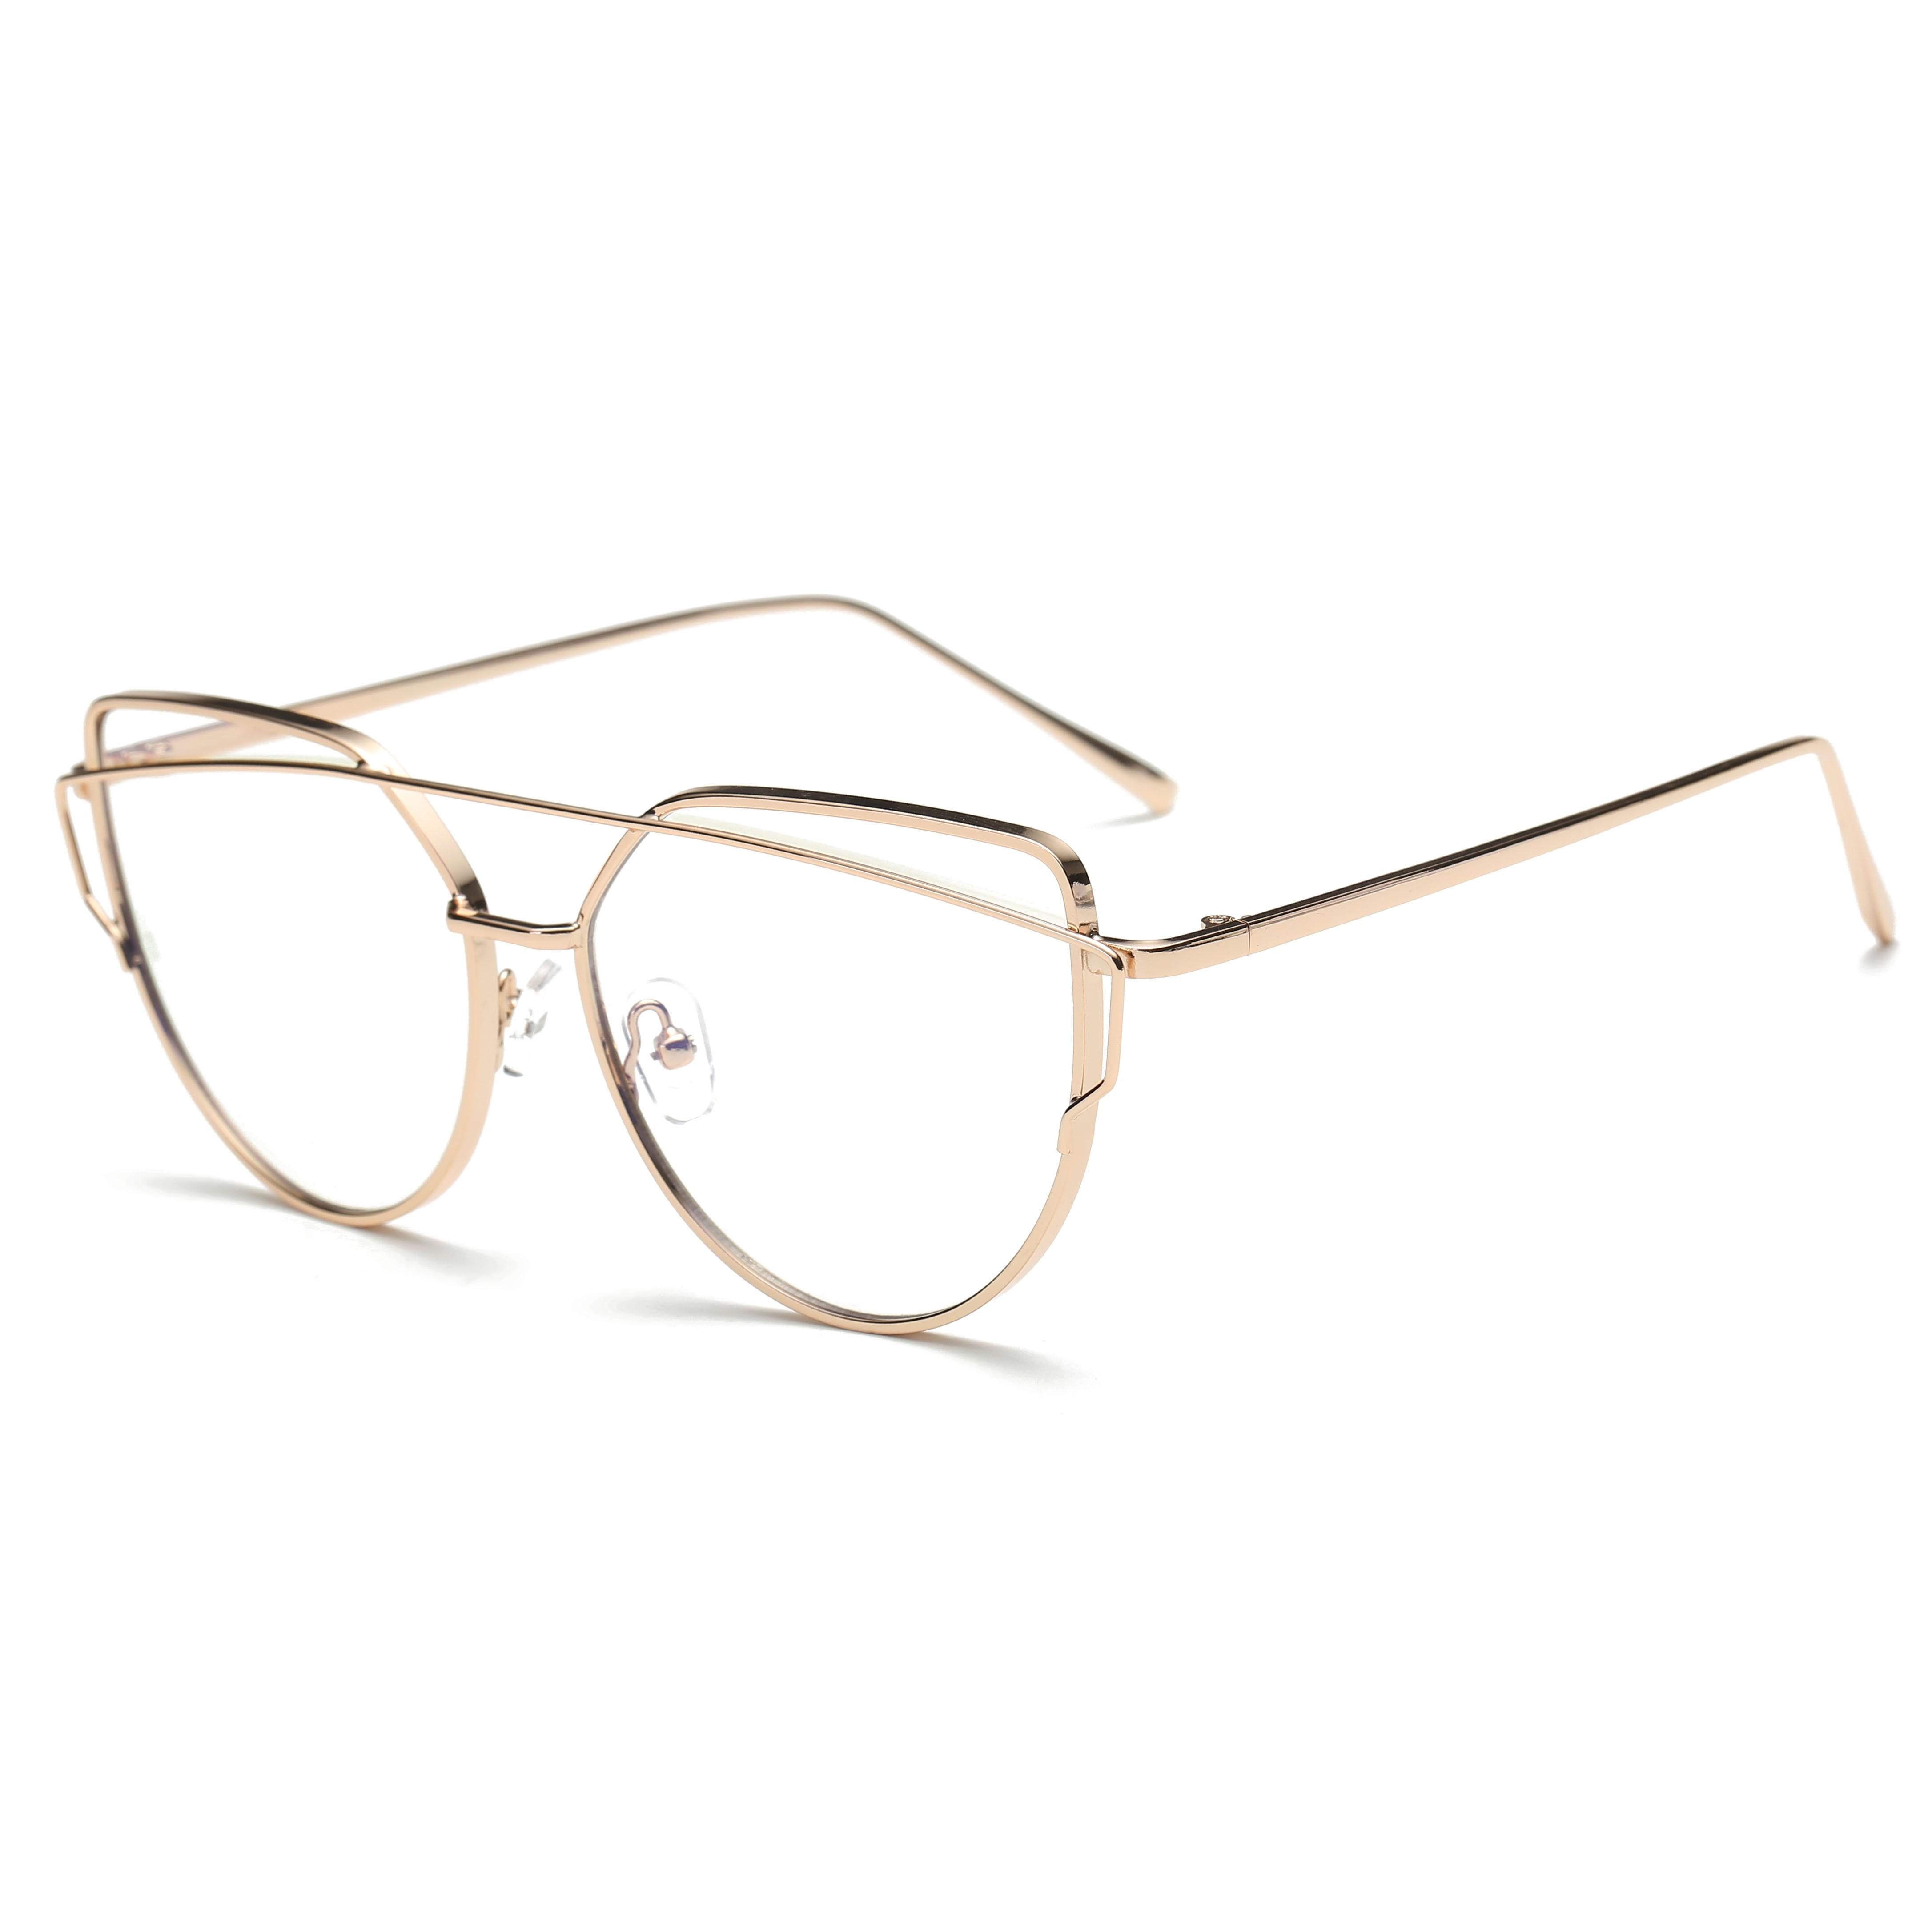 AOFLY Fashion Newest Style Frame Plain Eyeglass Frame Optics Clear ...